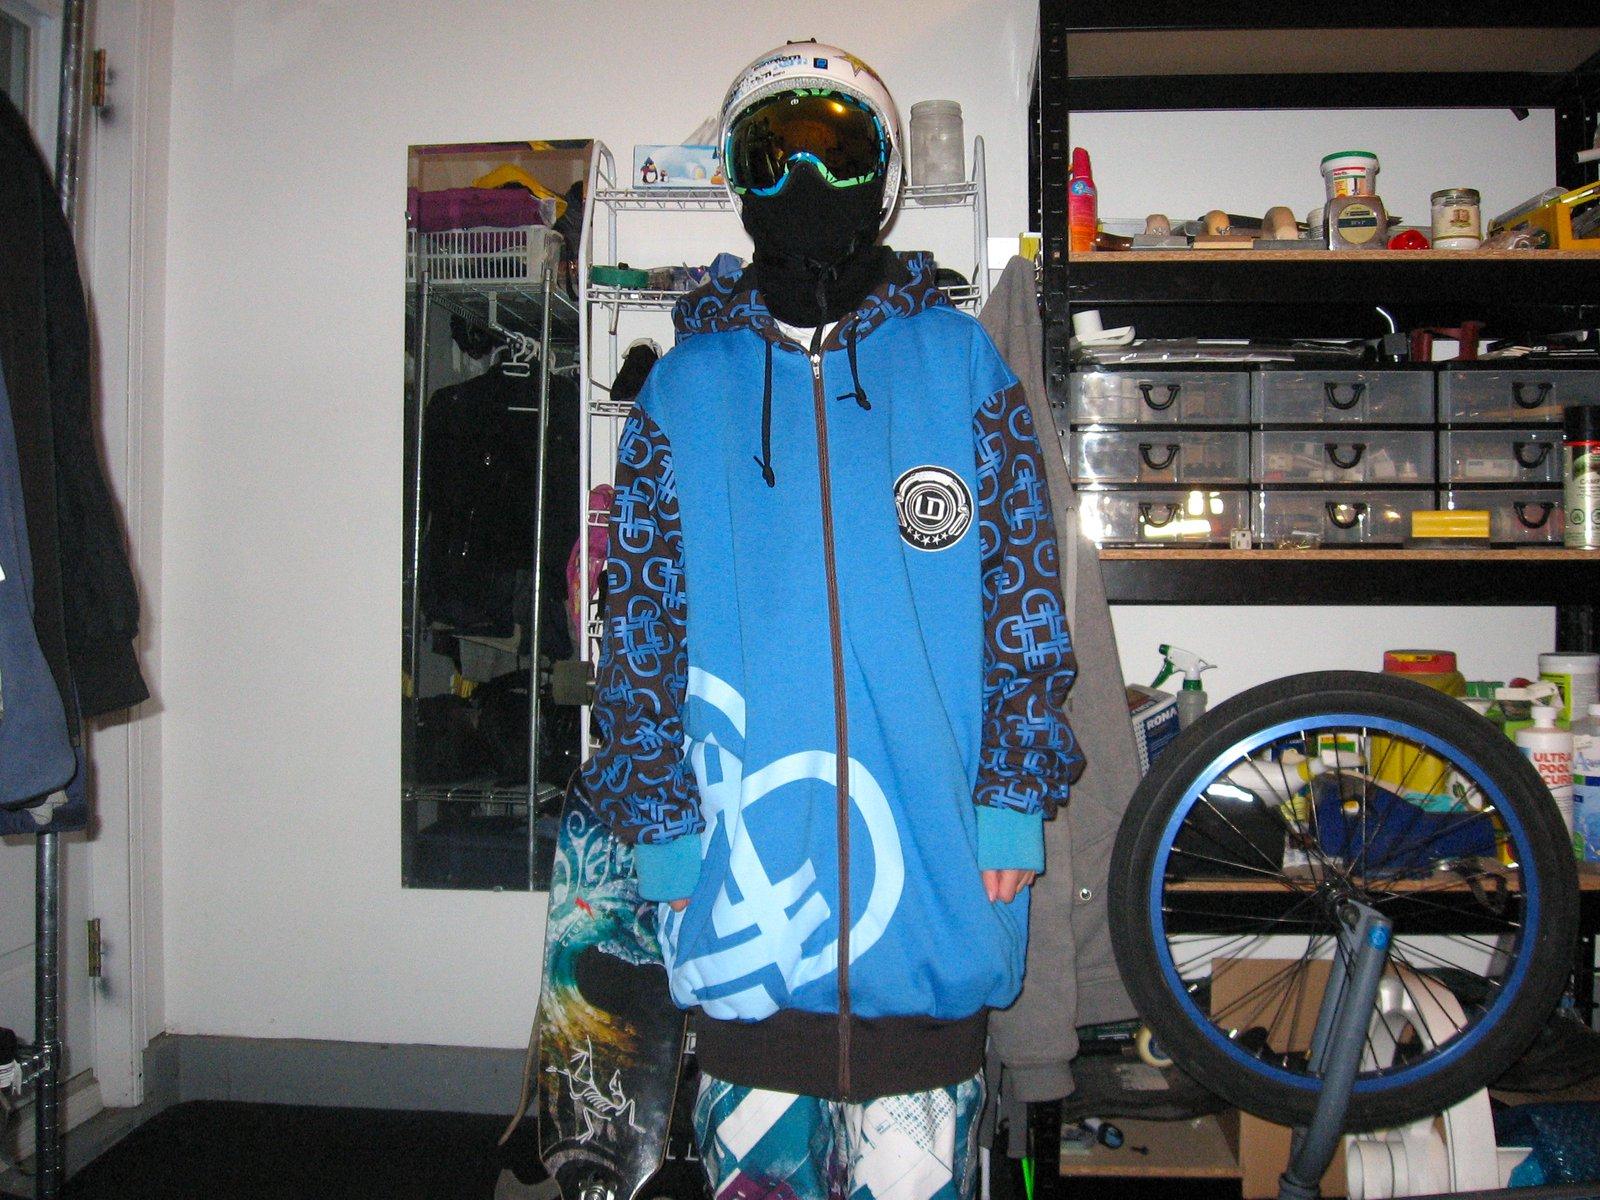 ldc day hoodie